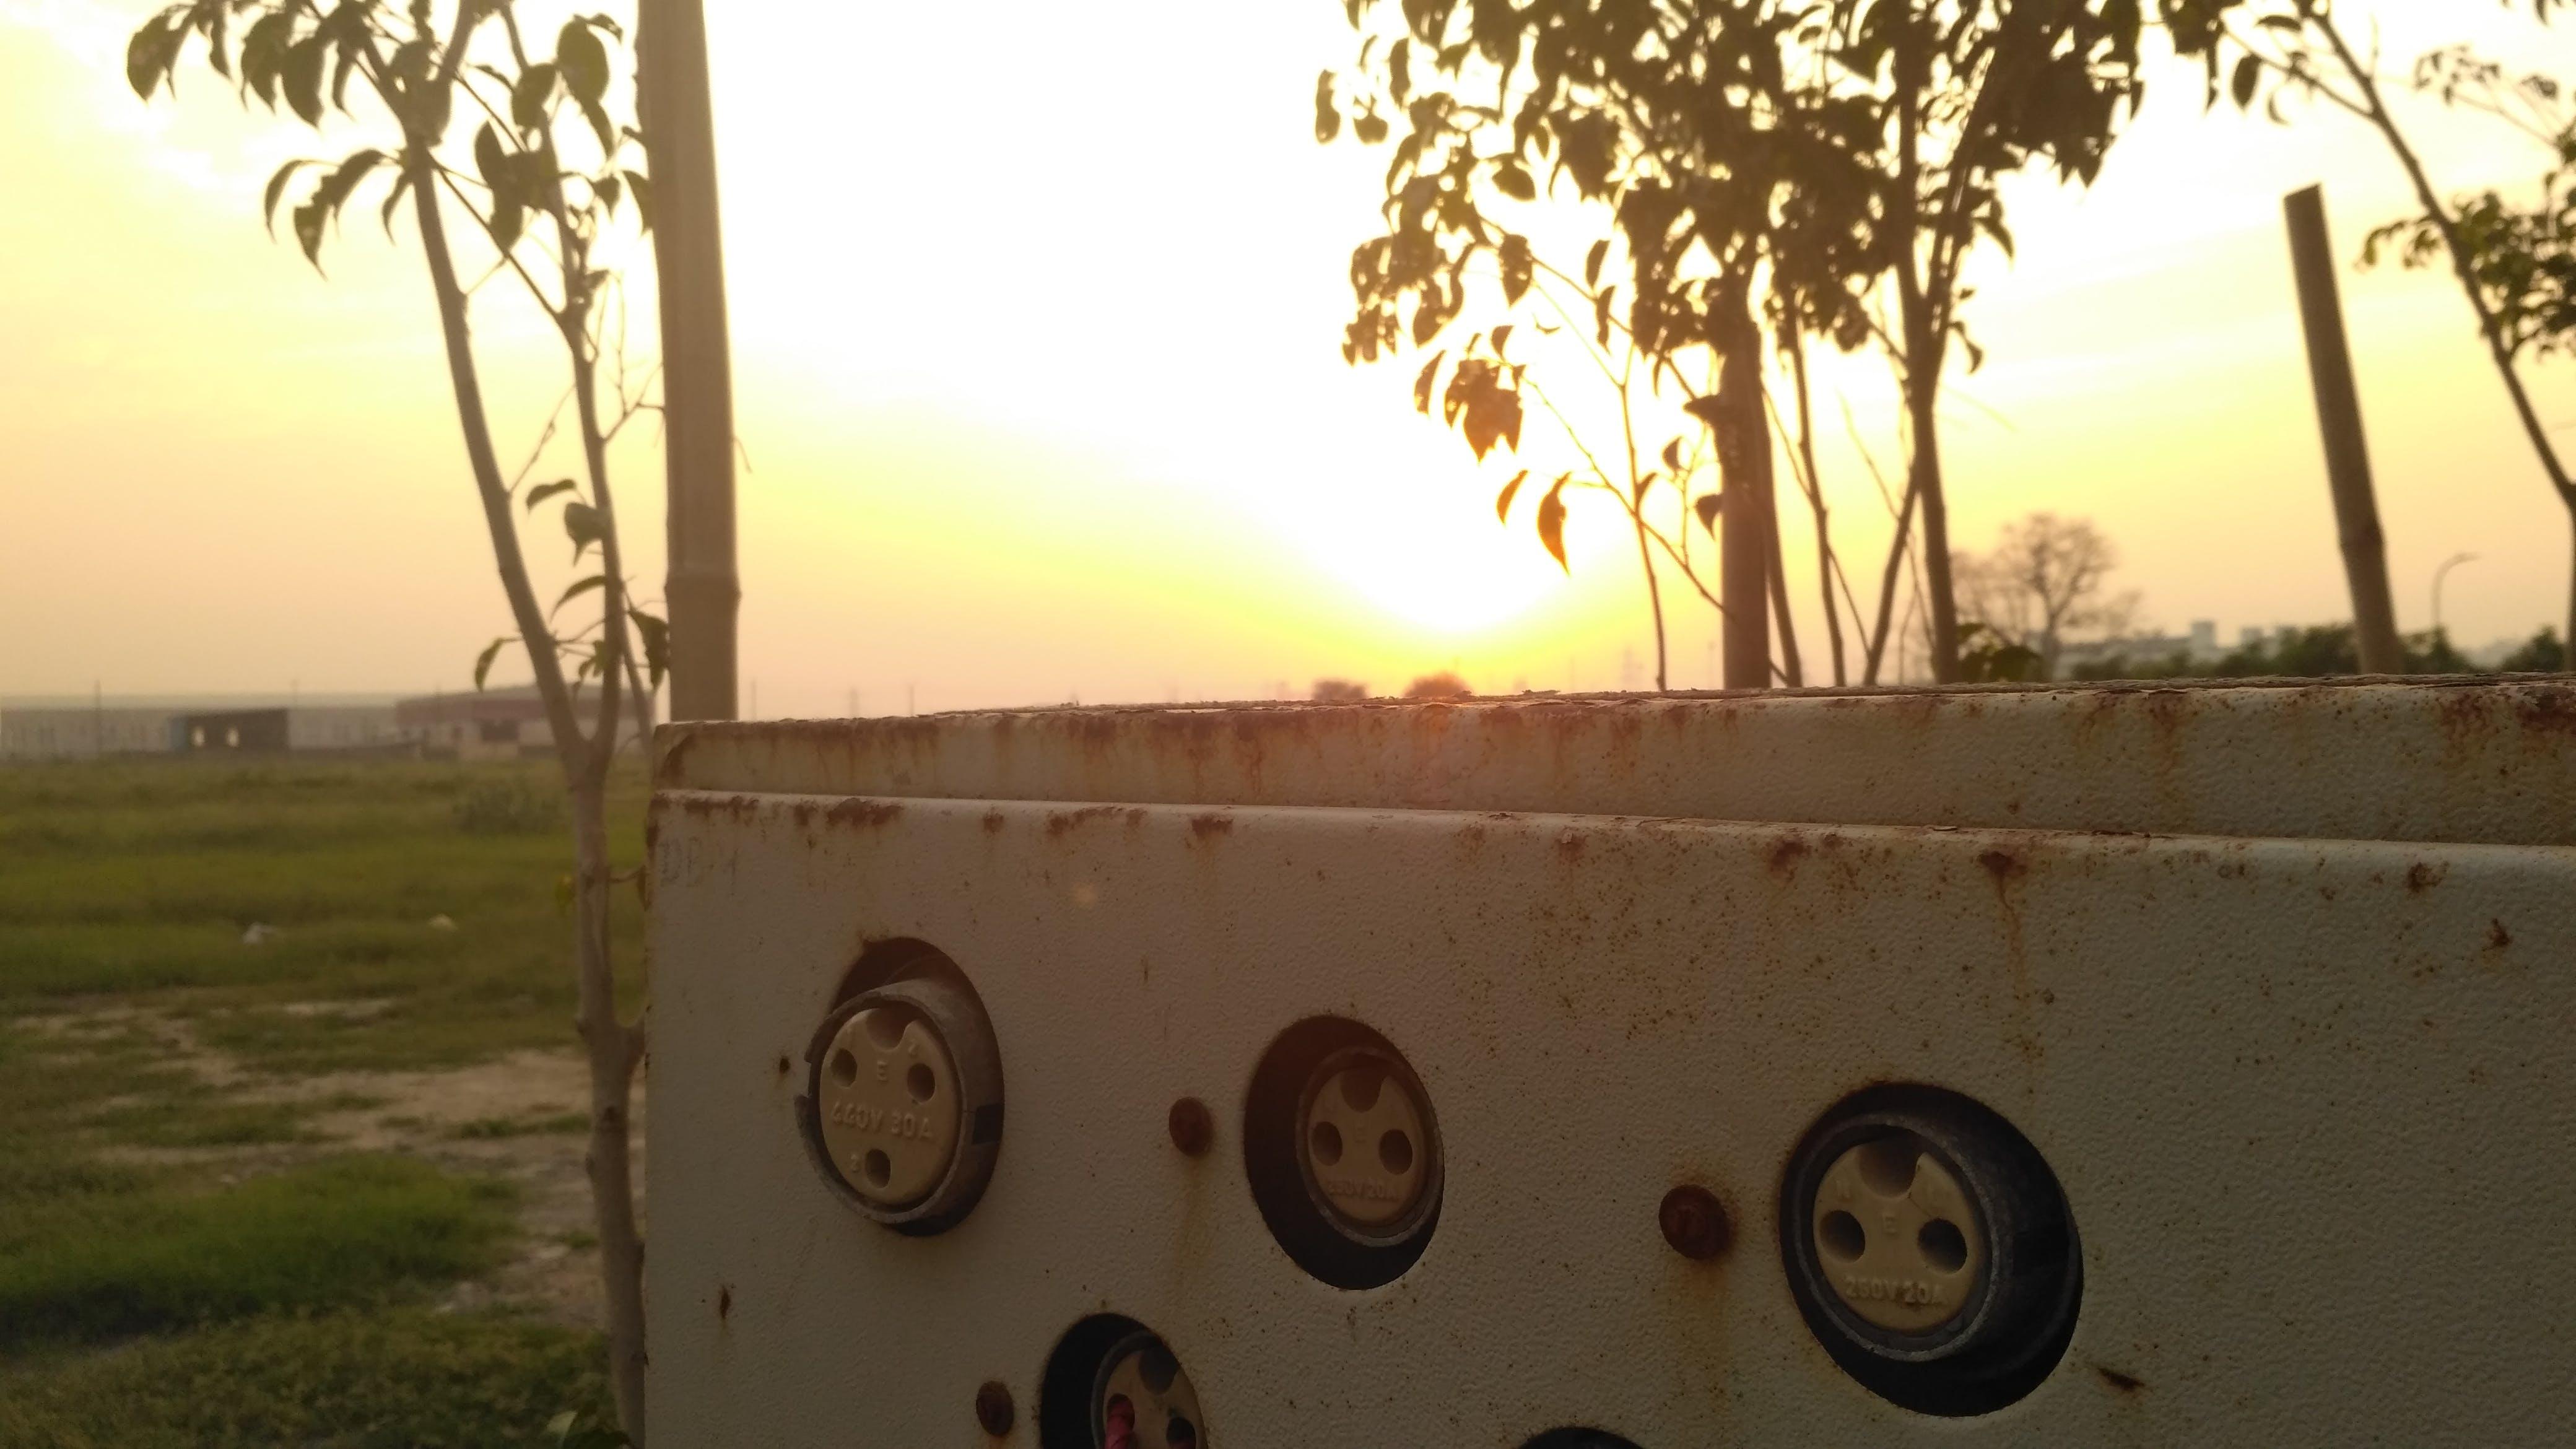 Gratis lagerfoto af rusten, solnedgang